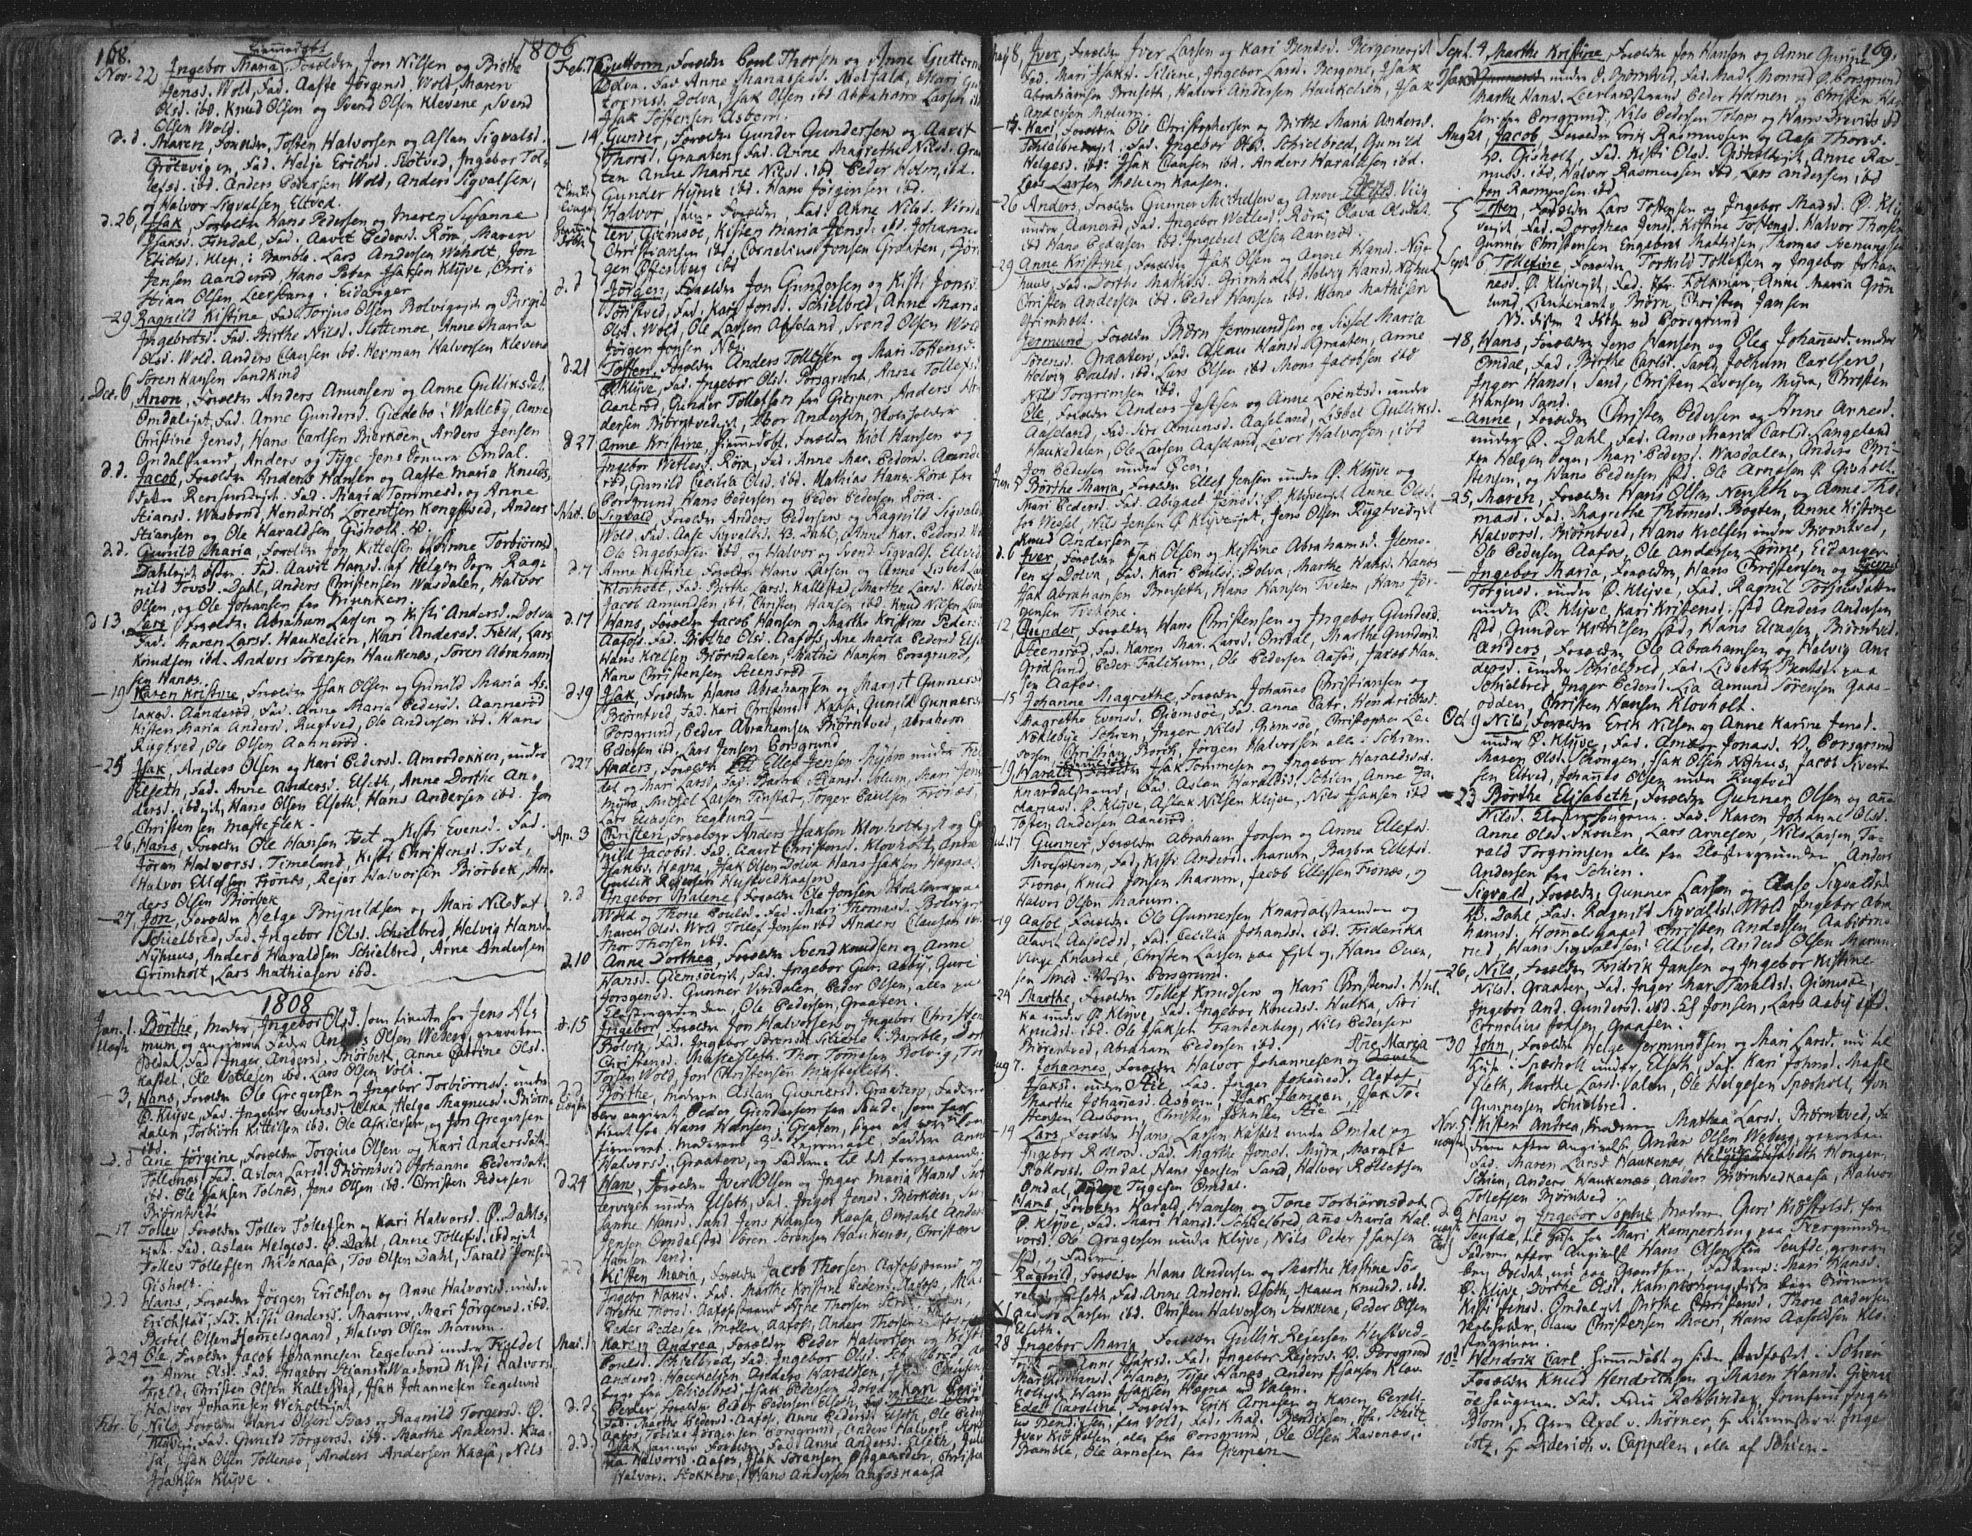 SAKO, Solum kirkebøker, F/Fa/L0003: Ministerialbok nr. I 3, 1761-1814, s. 168-169